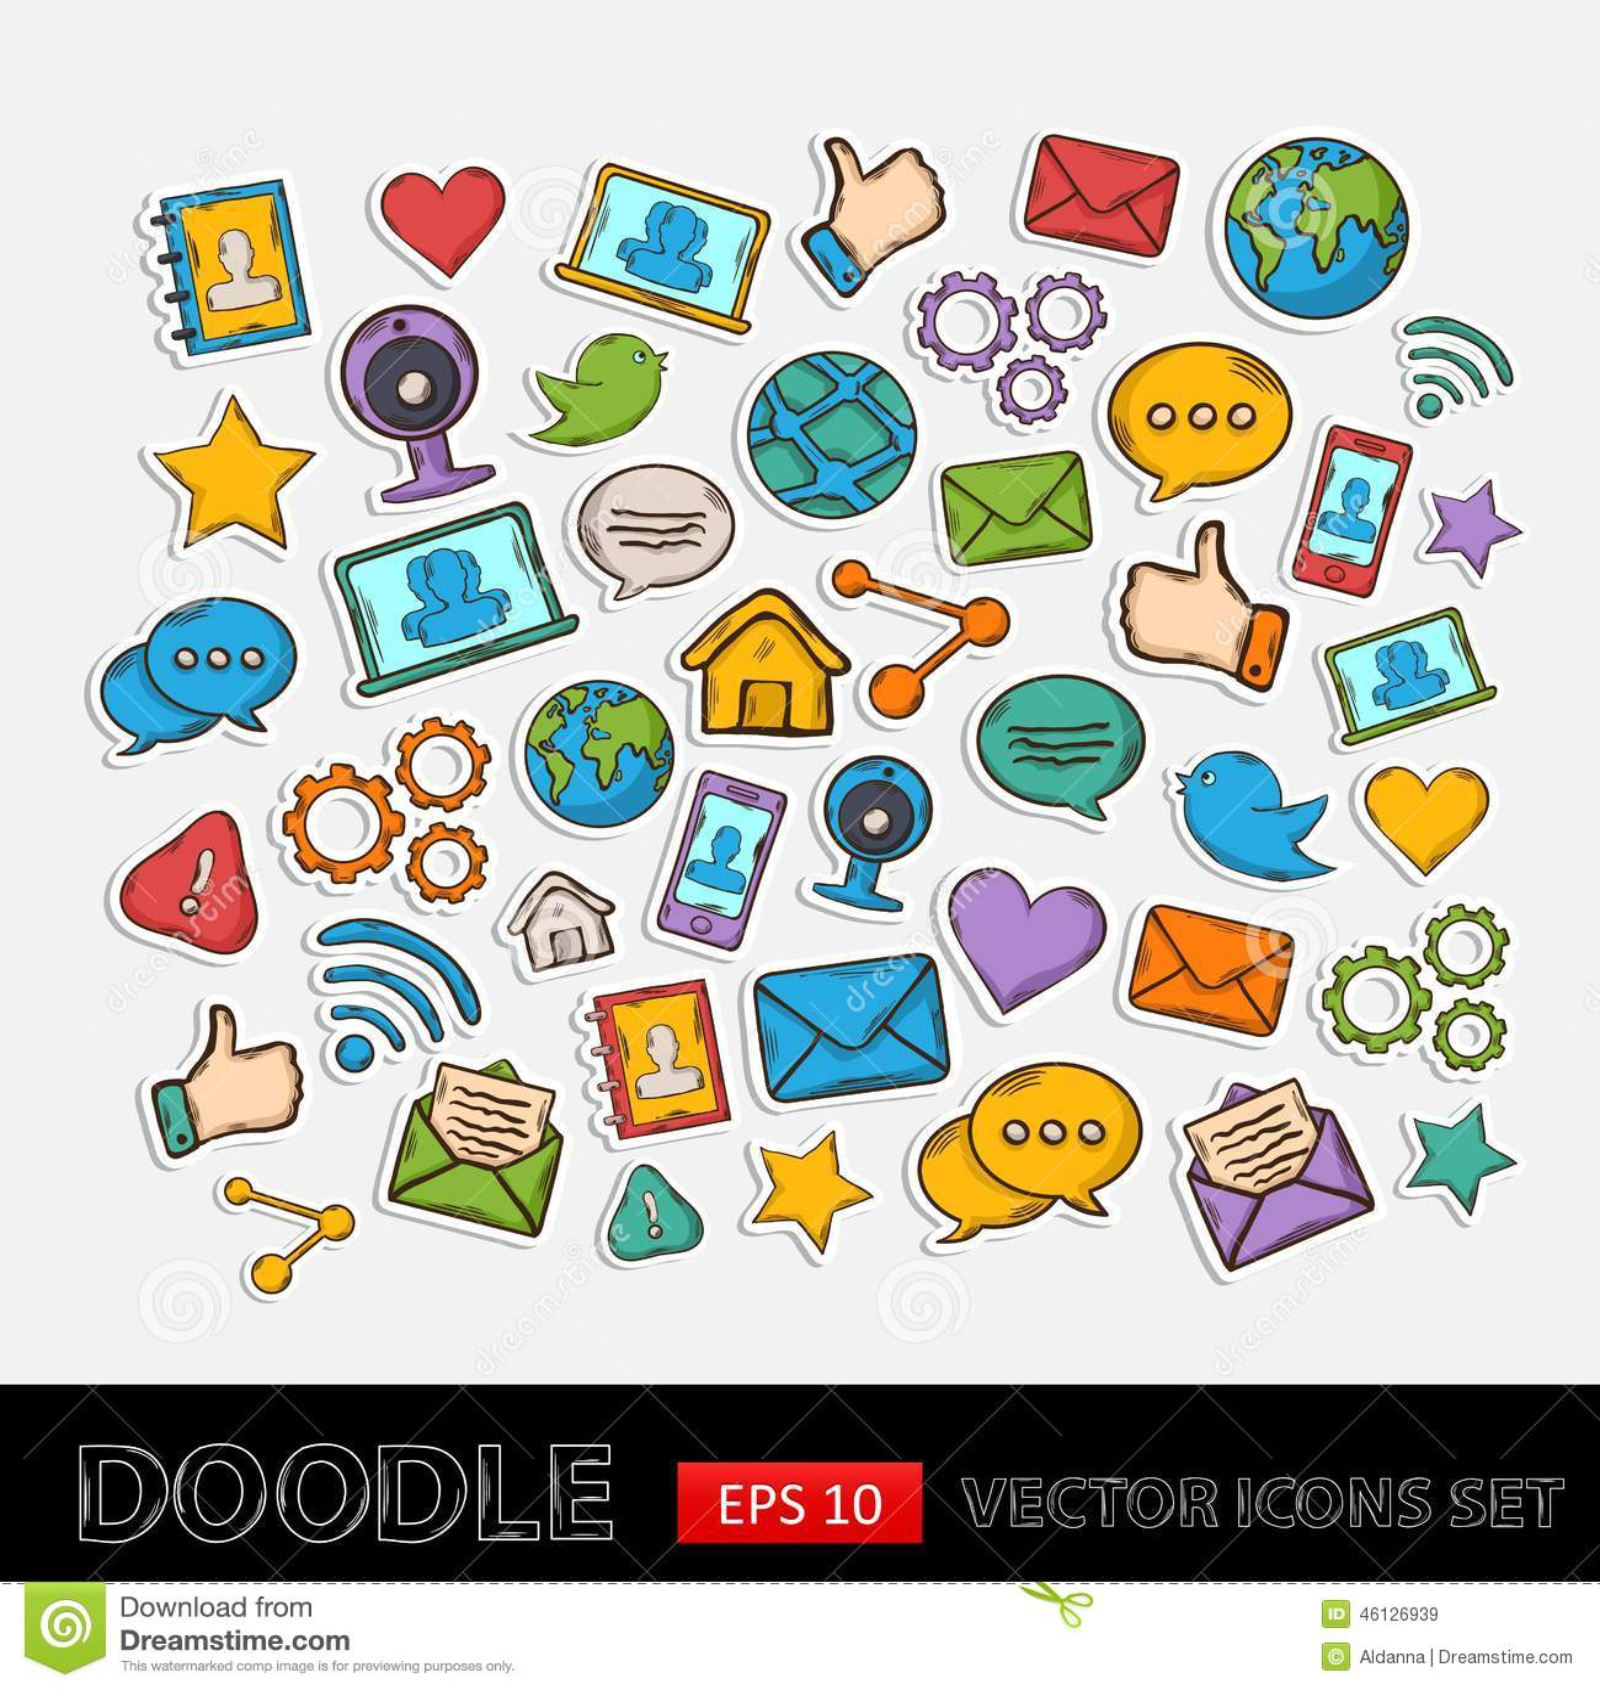 Doodle Social Network Set Stock Vector - Image: 46126939